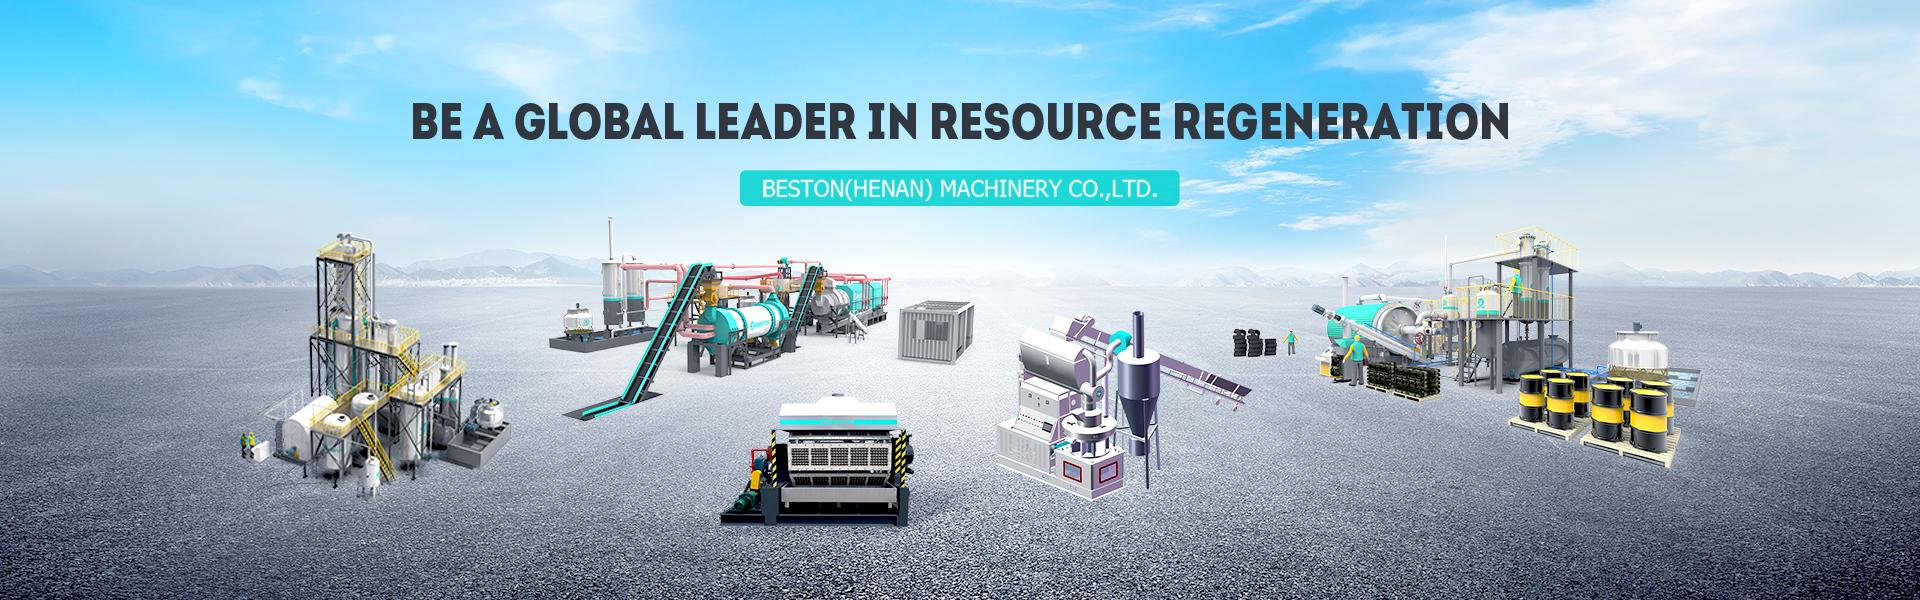 Beston Machinery لوحة الاعلان